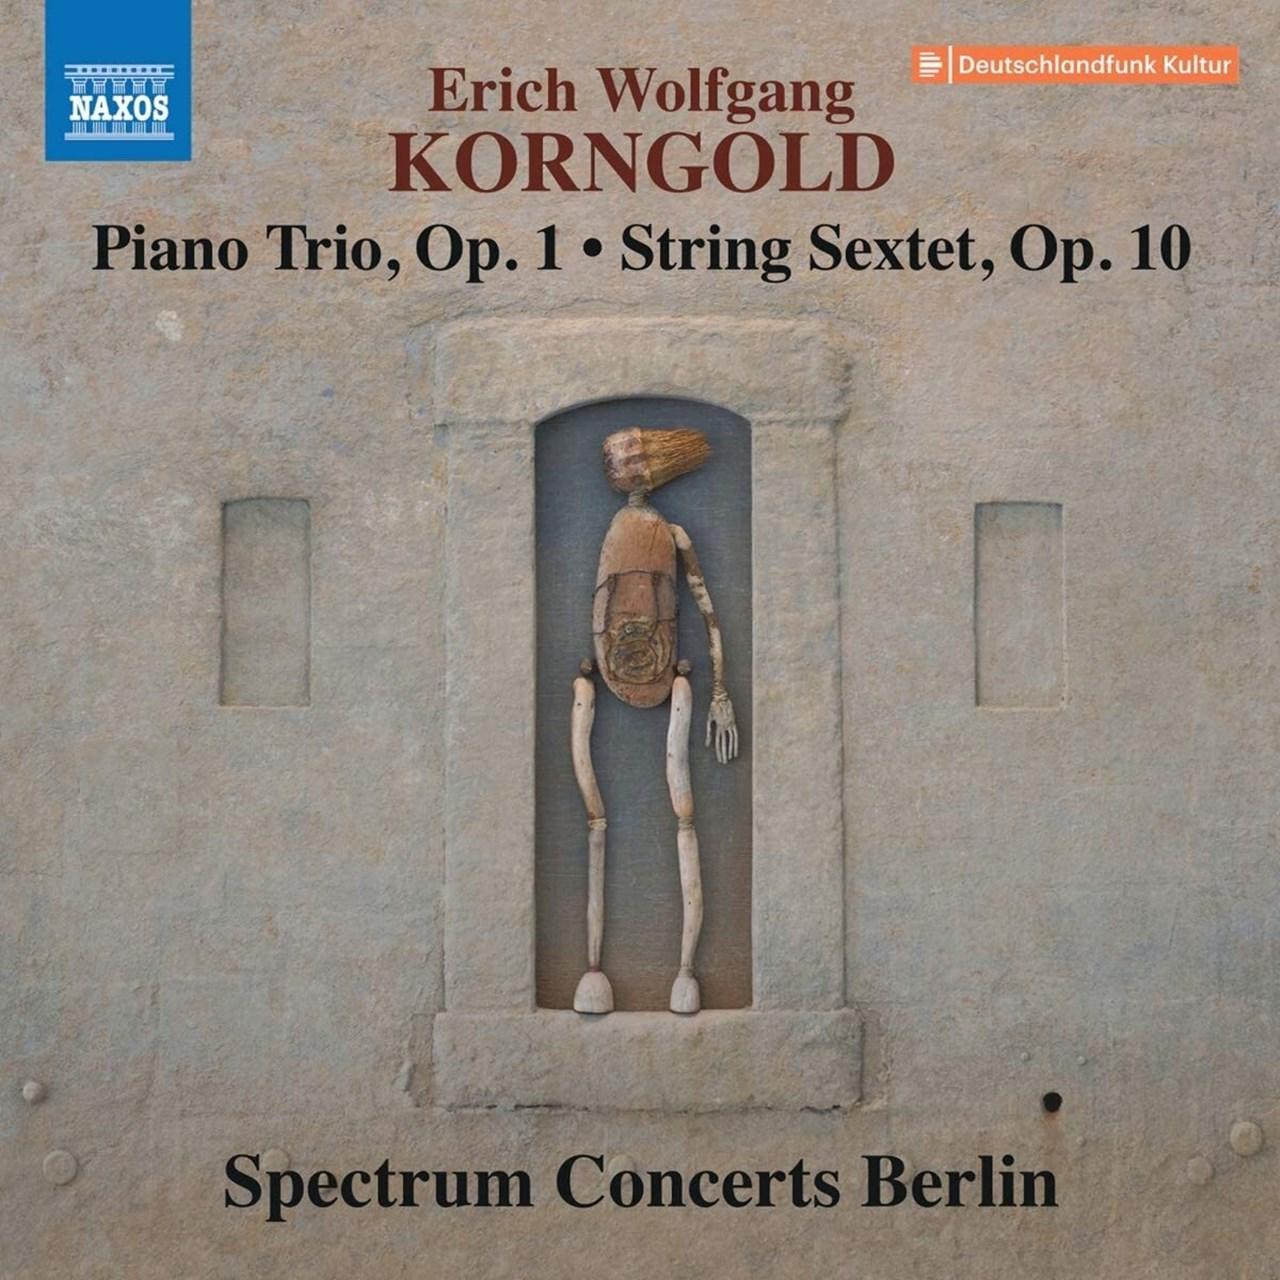 Erich Wolfgang Korngold: Piano Trio, Op. 1/String Sextet, Op. 10 - 1